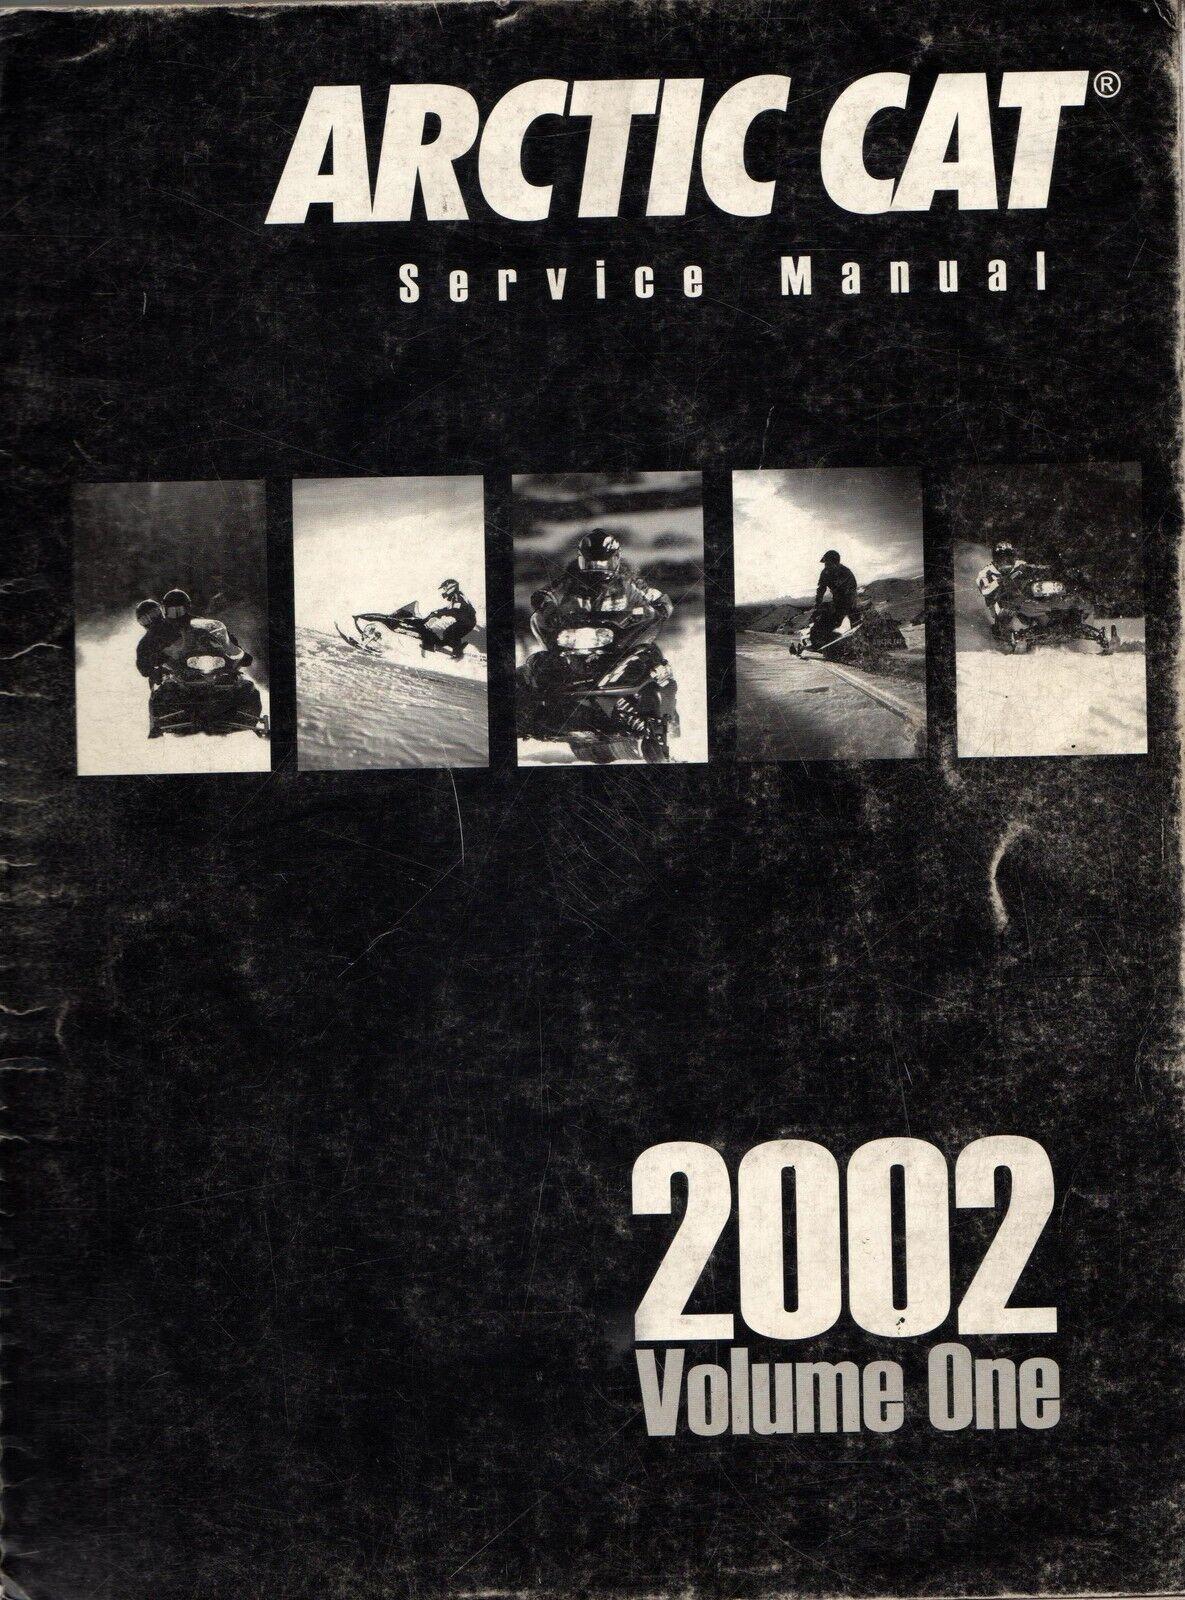 2002 ARCTIC CAT SNOWMOBILE VOLUME 1 SERVICE MANUAL P N 2256-457 (761)